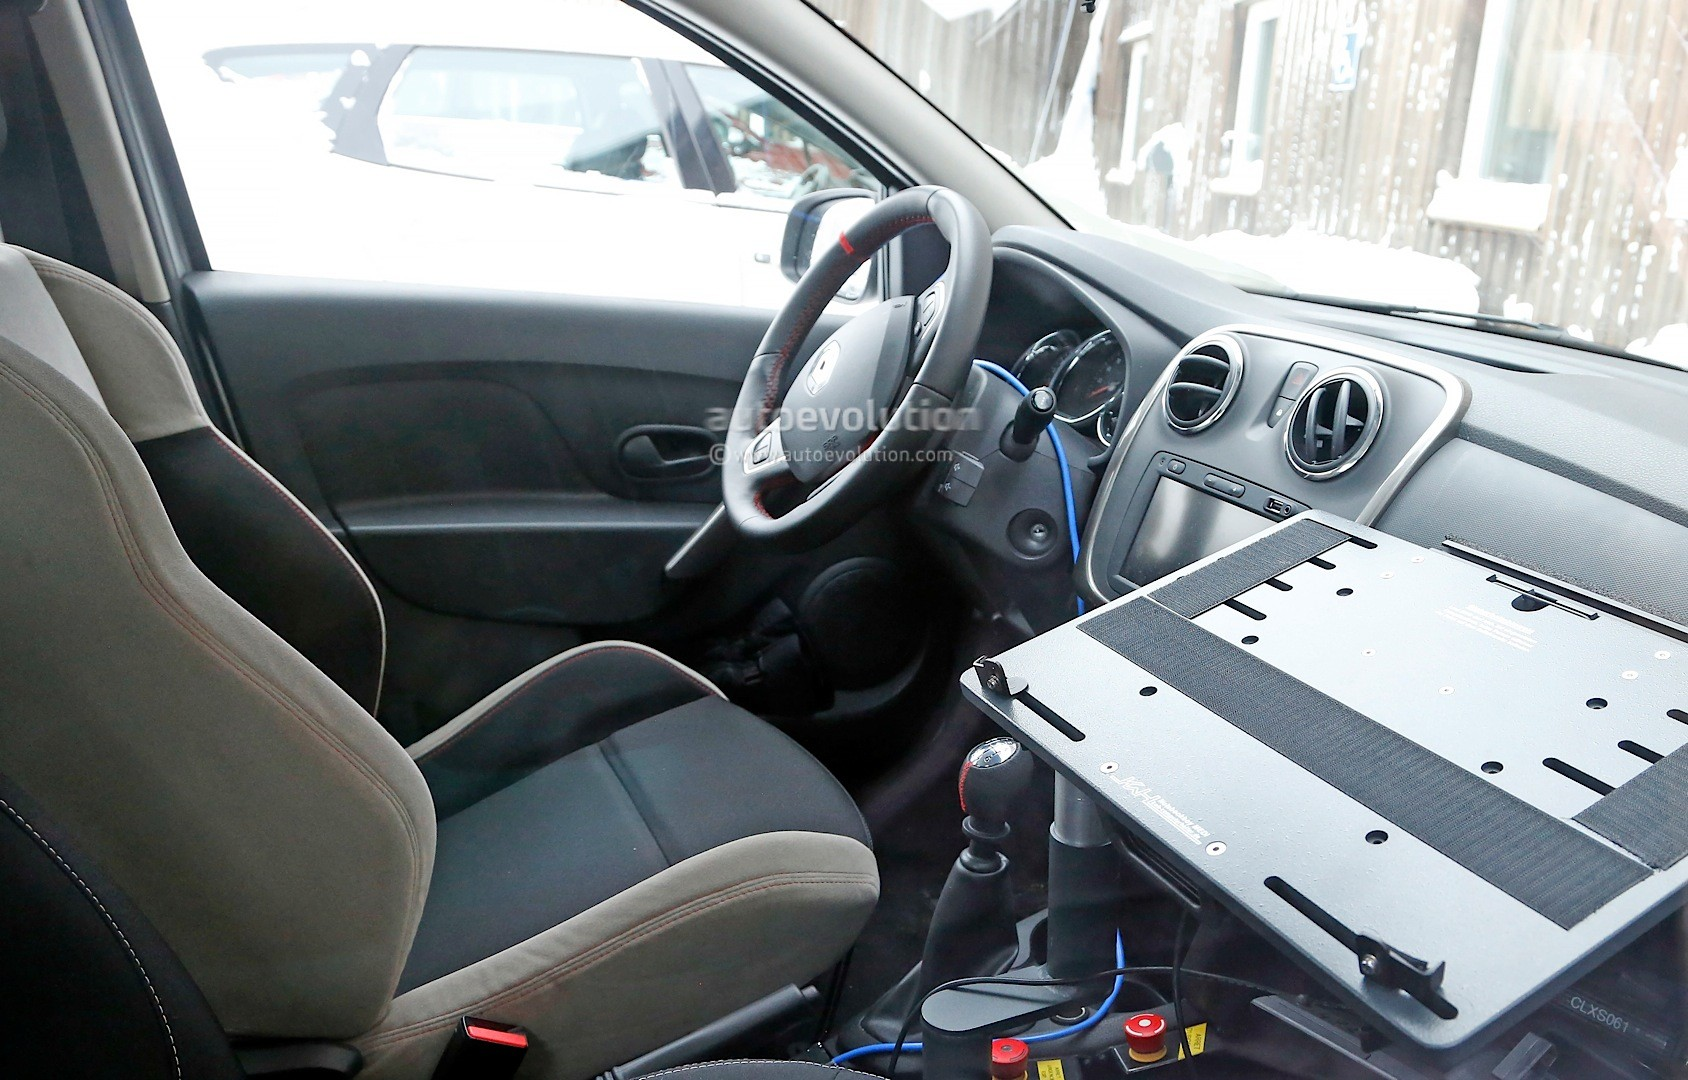 2012 - [Dacia] Sandero II - Page 14 Spyshots-dacia-sandero-rs-getting-12-turbo-engine-sportier-interior_8